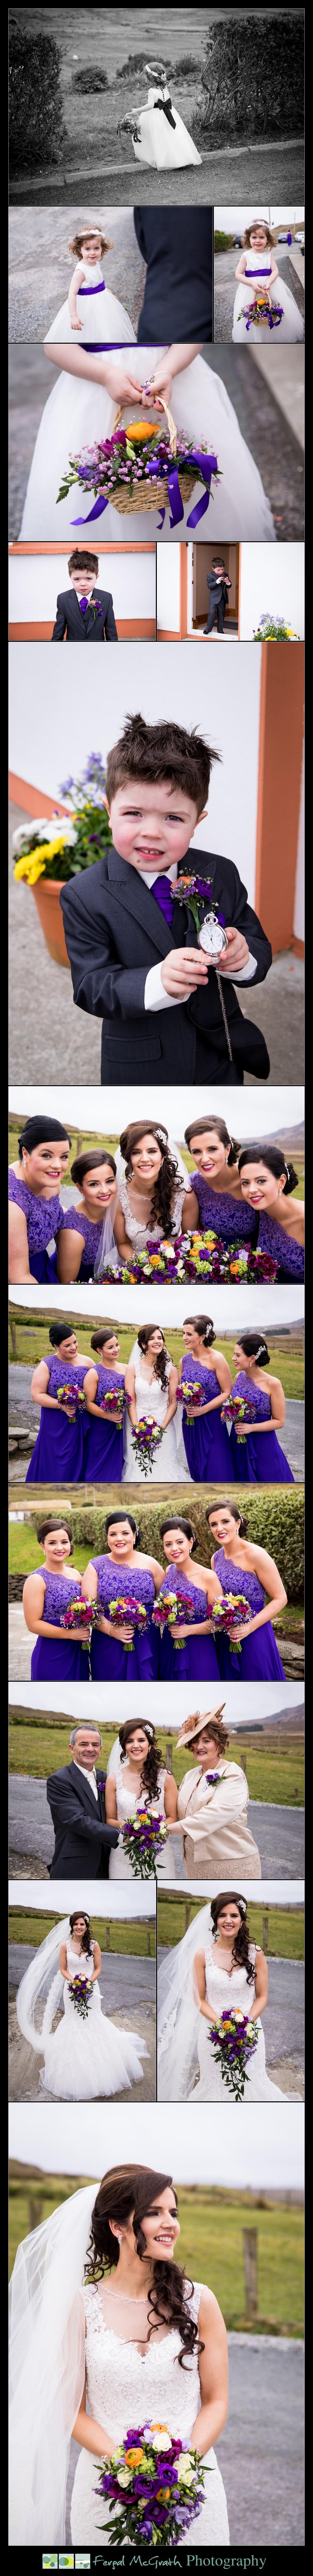 Glencolmcille wedding candid photos